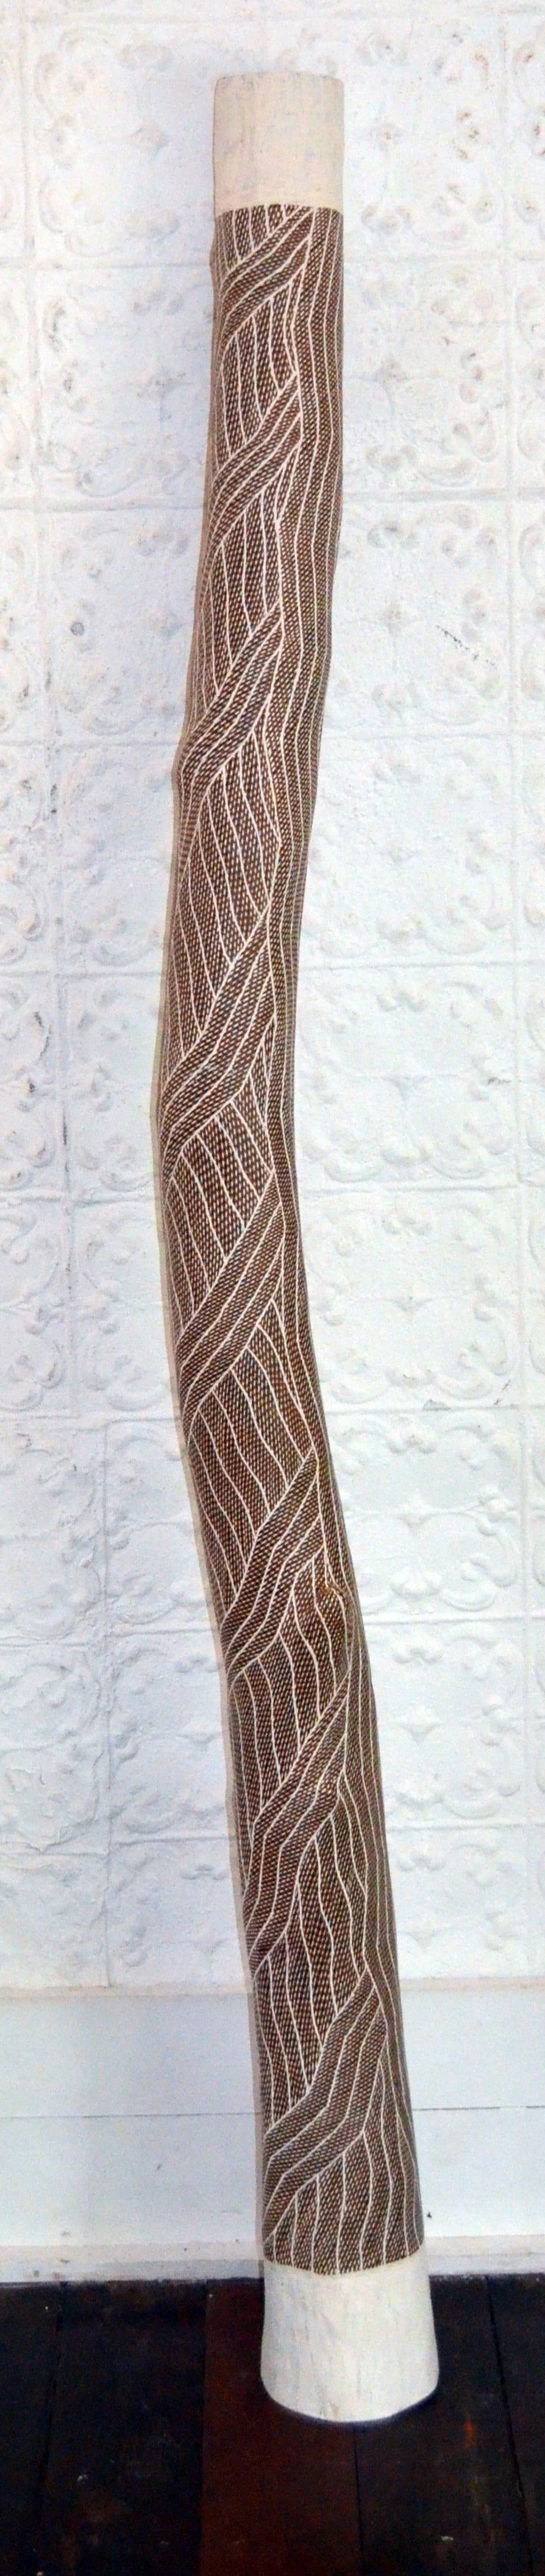 Manini Gumana Garraparra Larrakitj Ochre on wood 200 cm